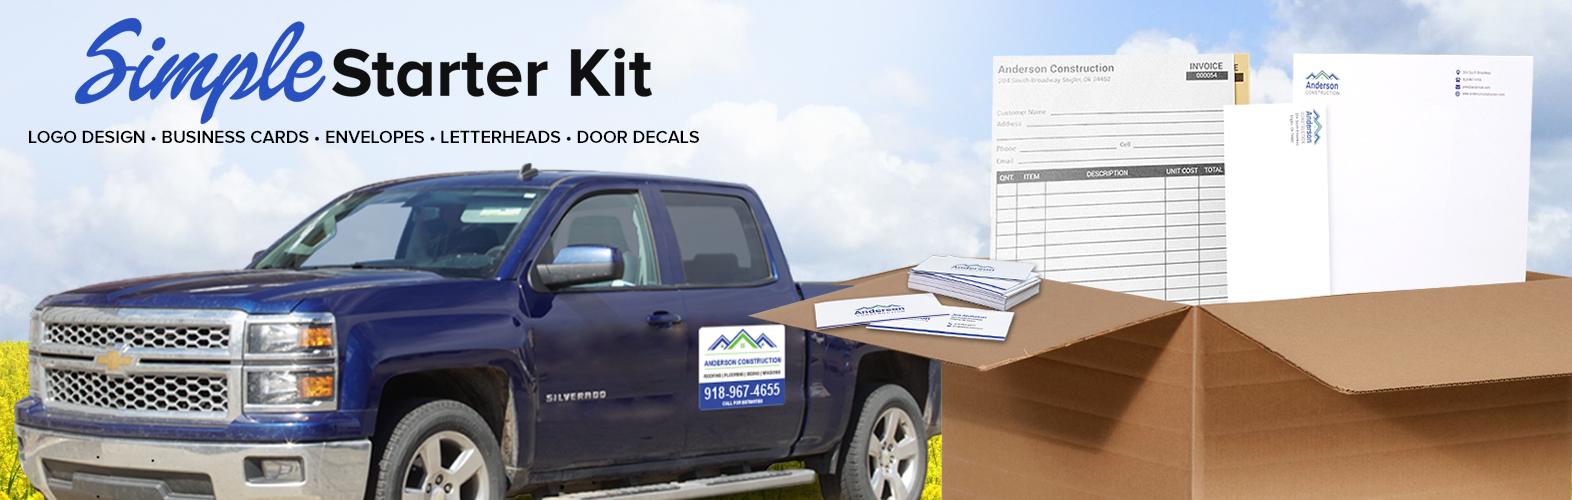 Simple Stater Kit